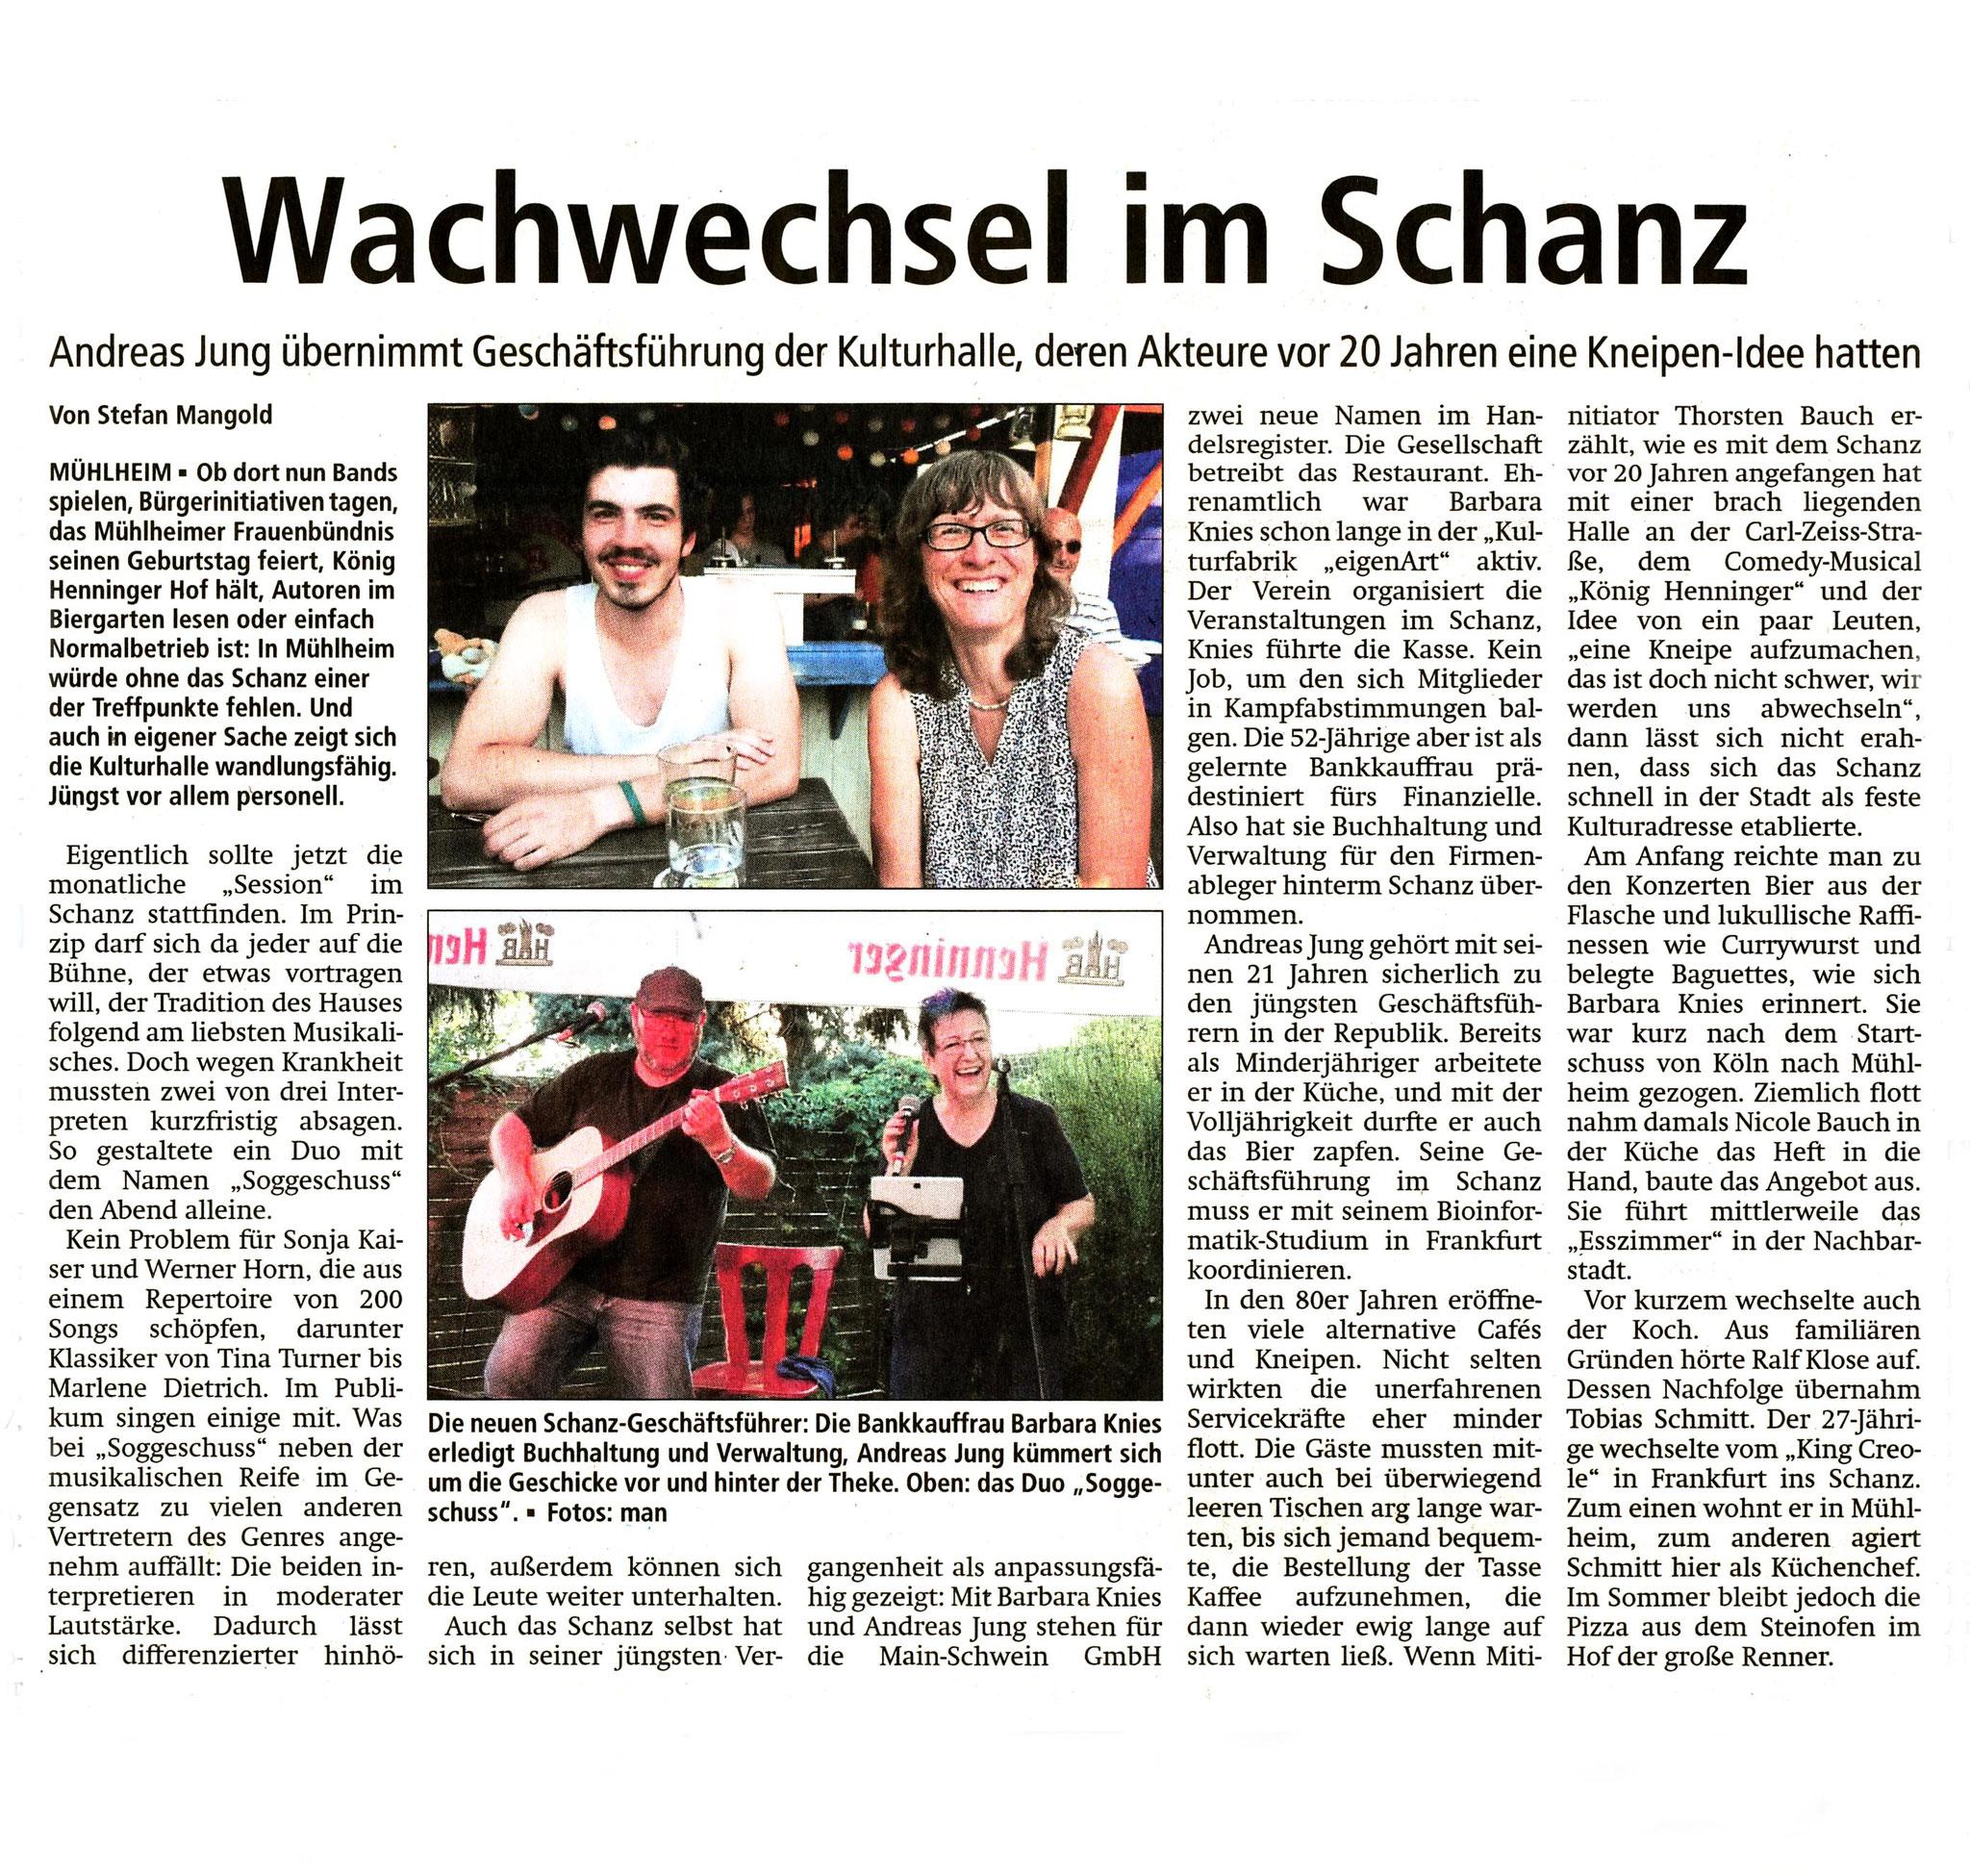 Offenbach Post, 31. Juli 2018